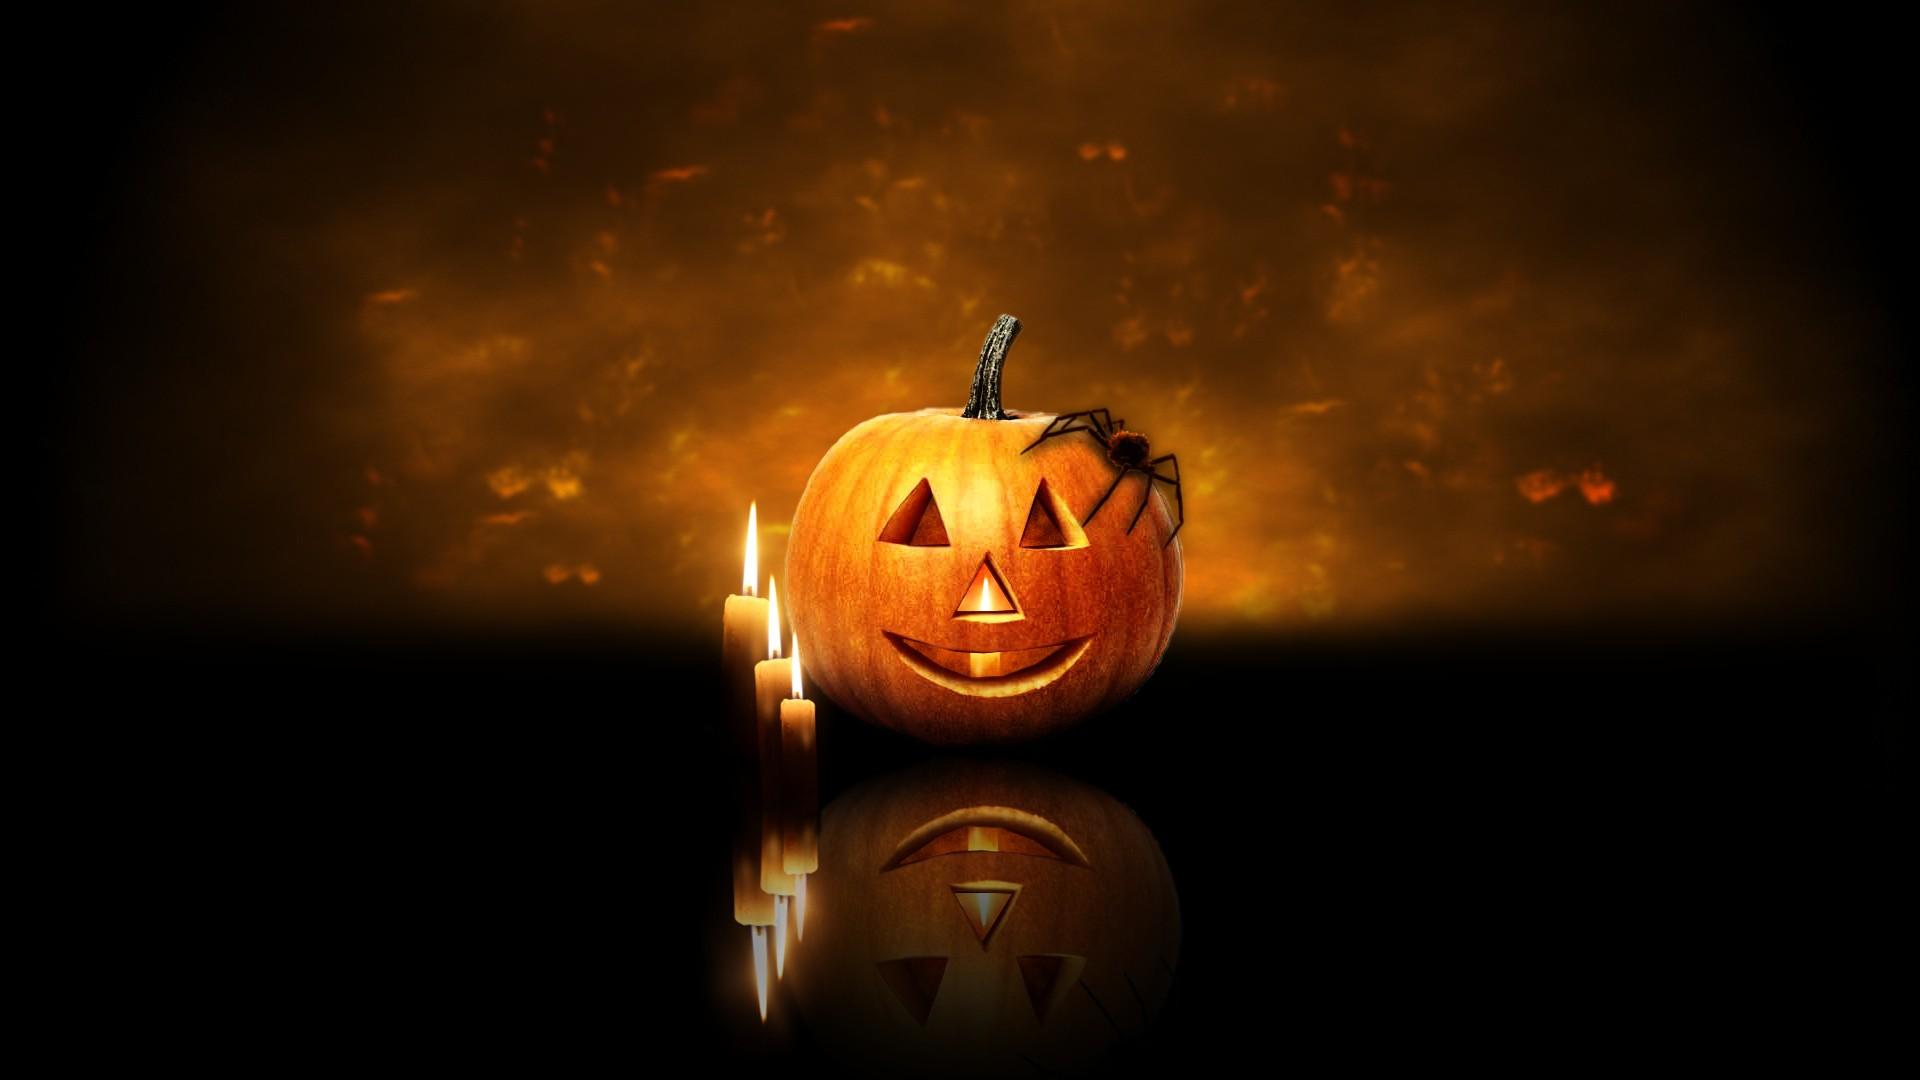 Wonderful Wallpaper Halloween Home Screen - 102673-download-halloween-wallpaper-hd-1920x1080-ipad  Snapshot_434617.jpg